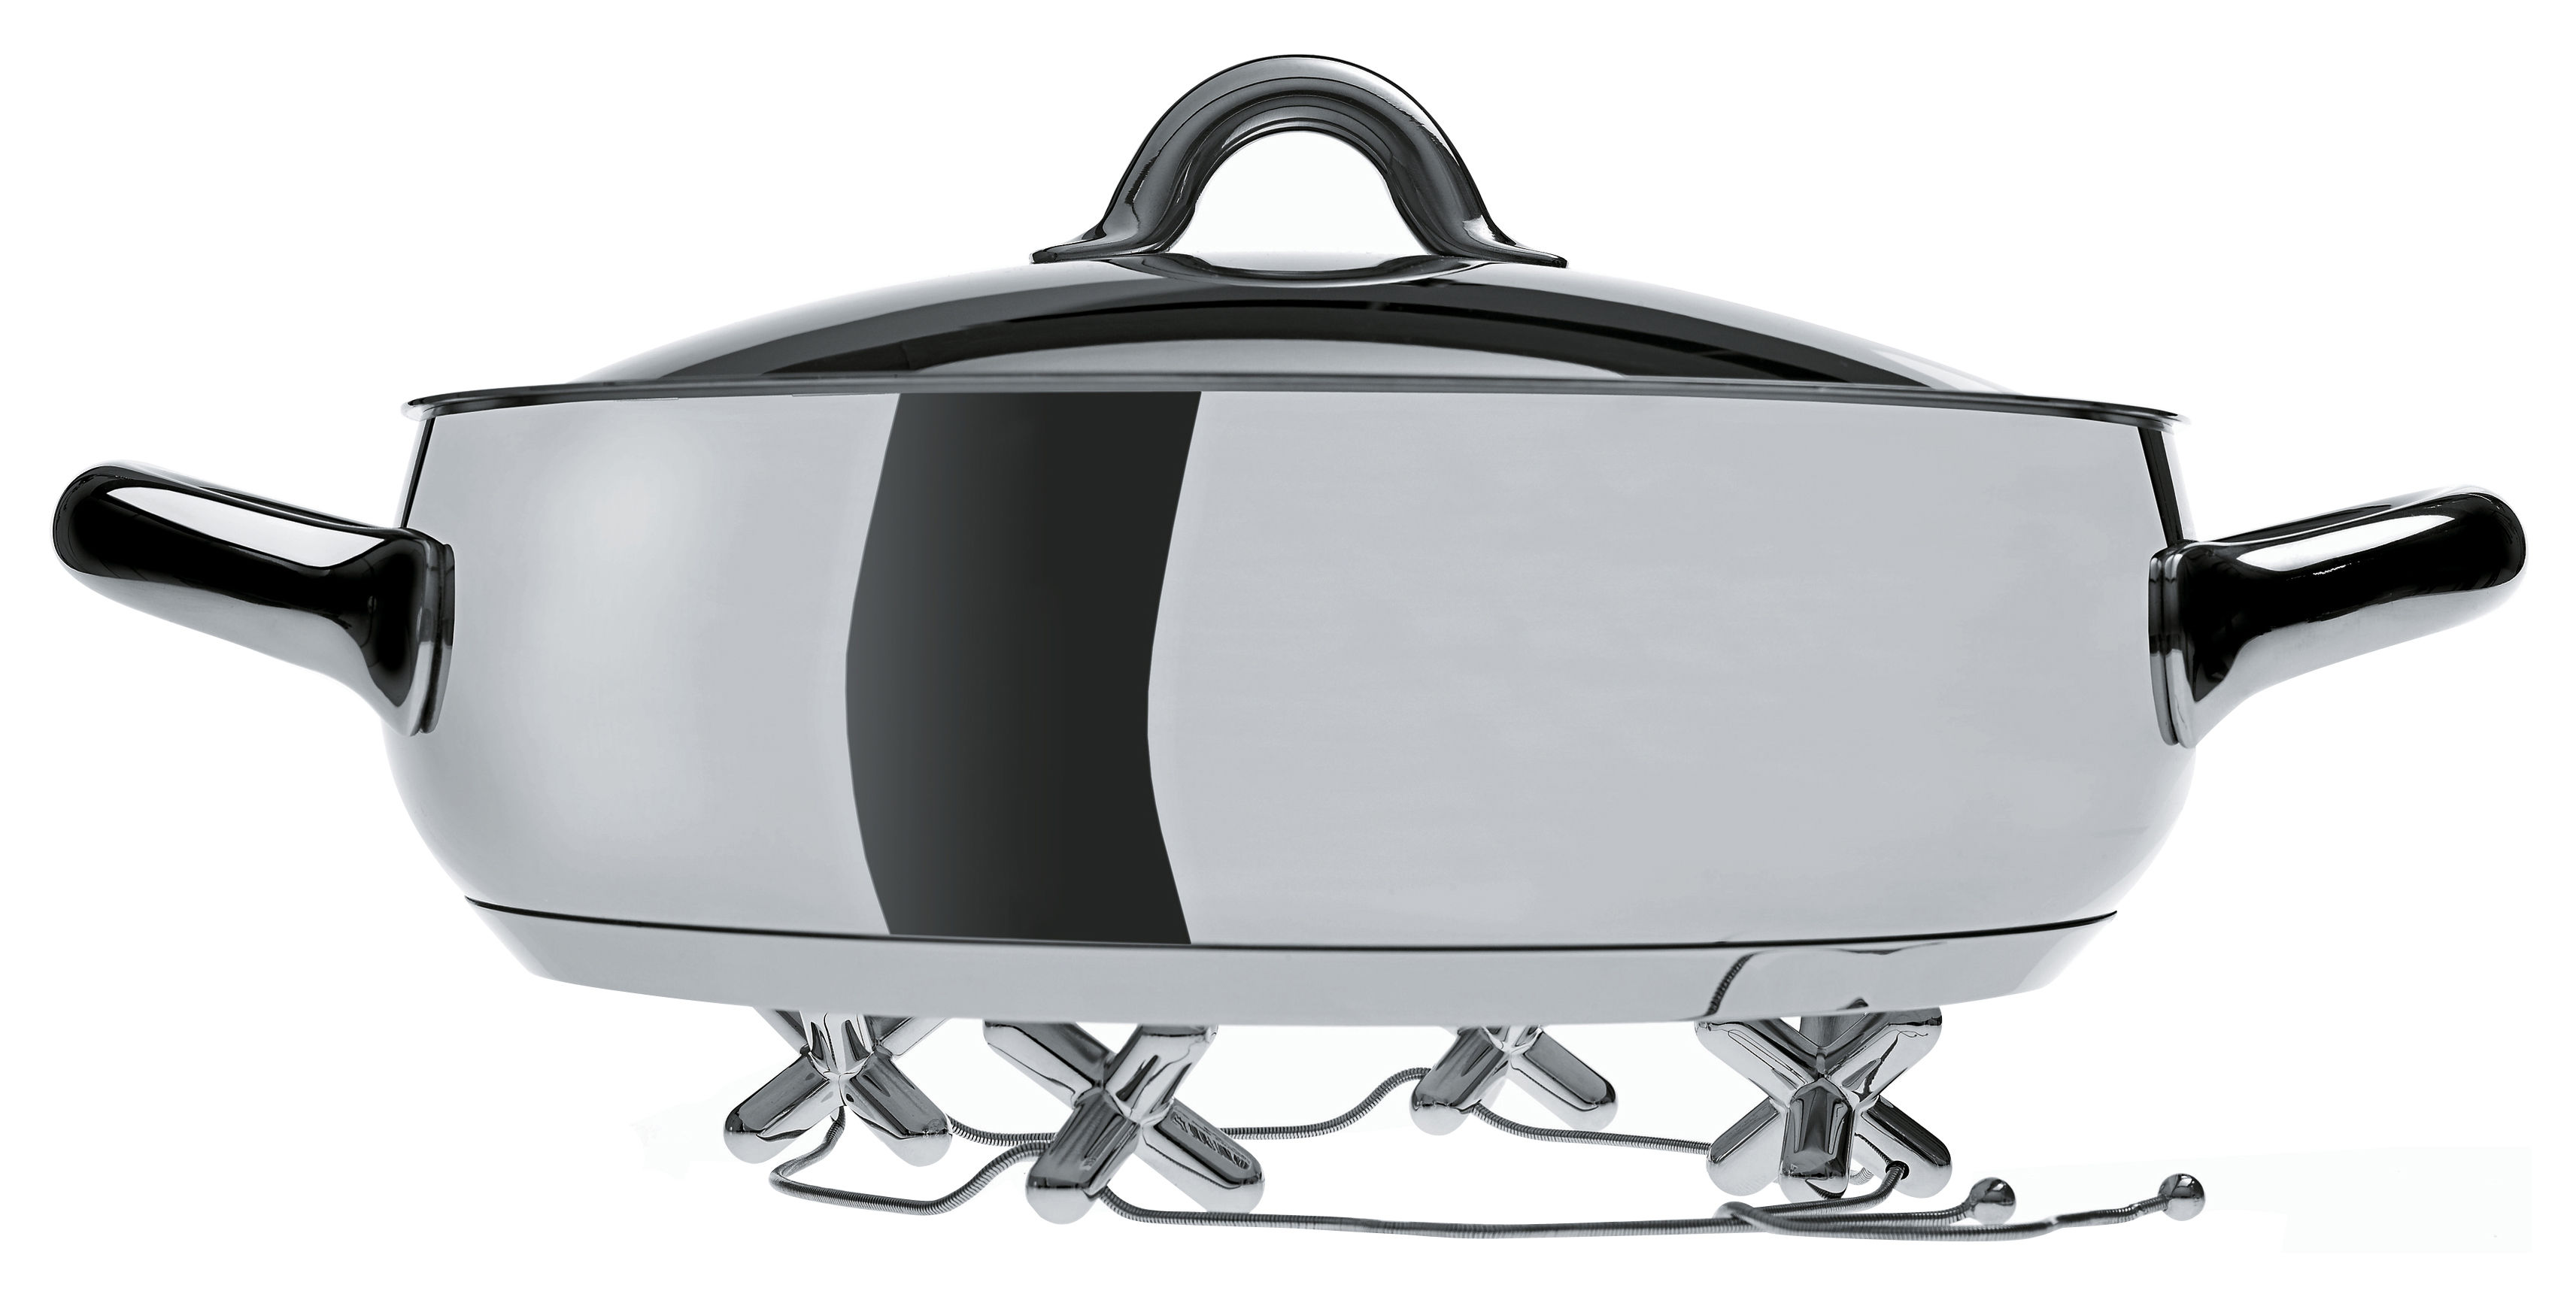 Tischkultur - Topfuntersetzer - Tripod Topfuntersetzer - Alessi - Verchromt - verchromtes Zamac